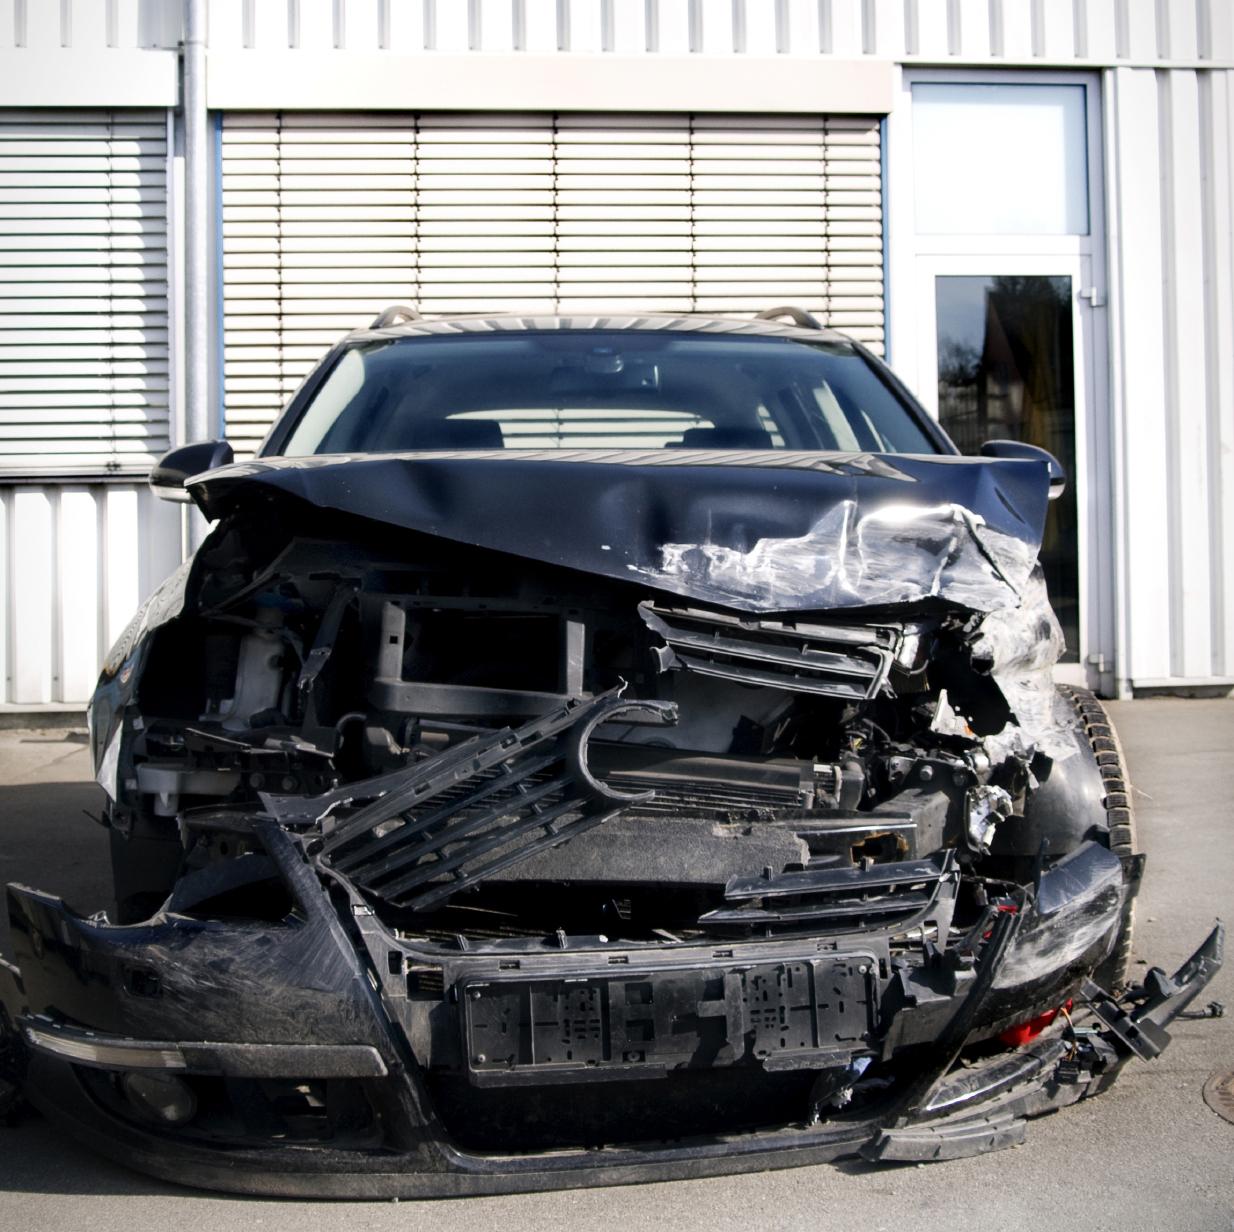 Chevrolet Collision Repair in Clinton Township, MI